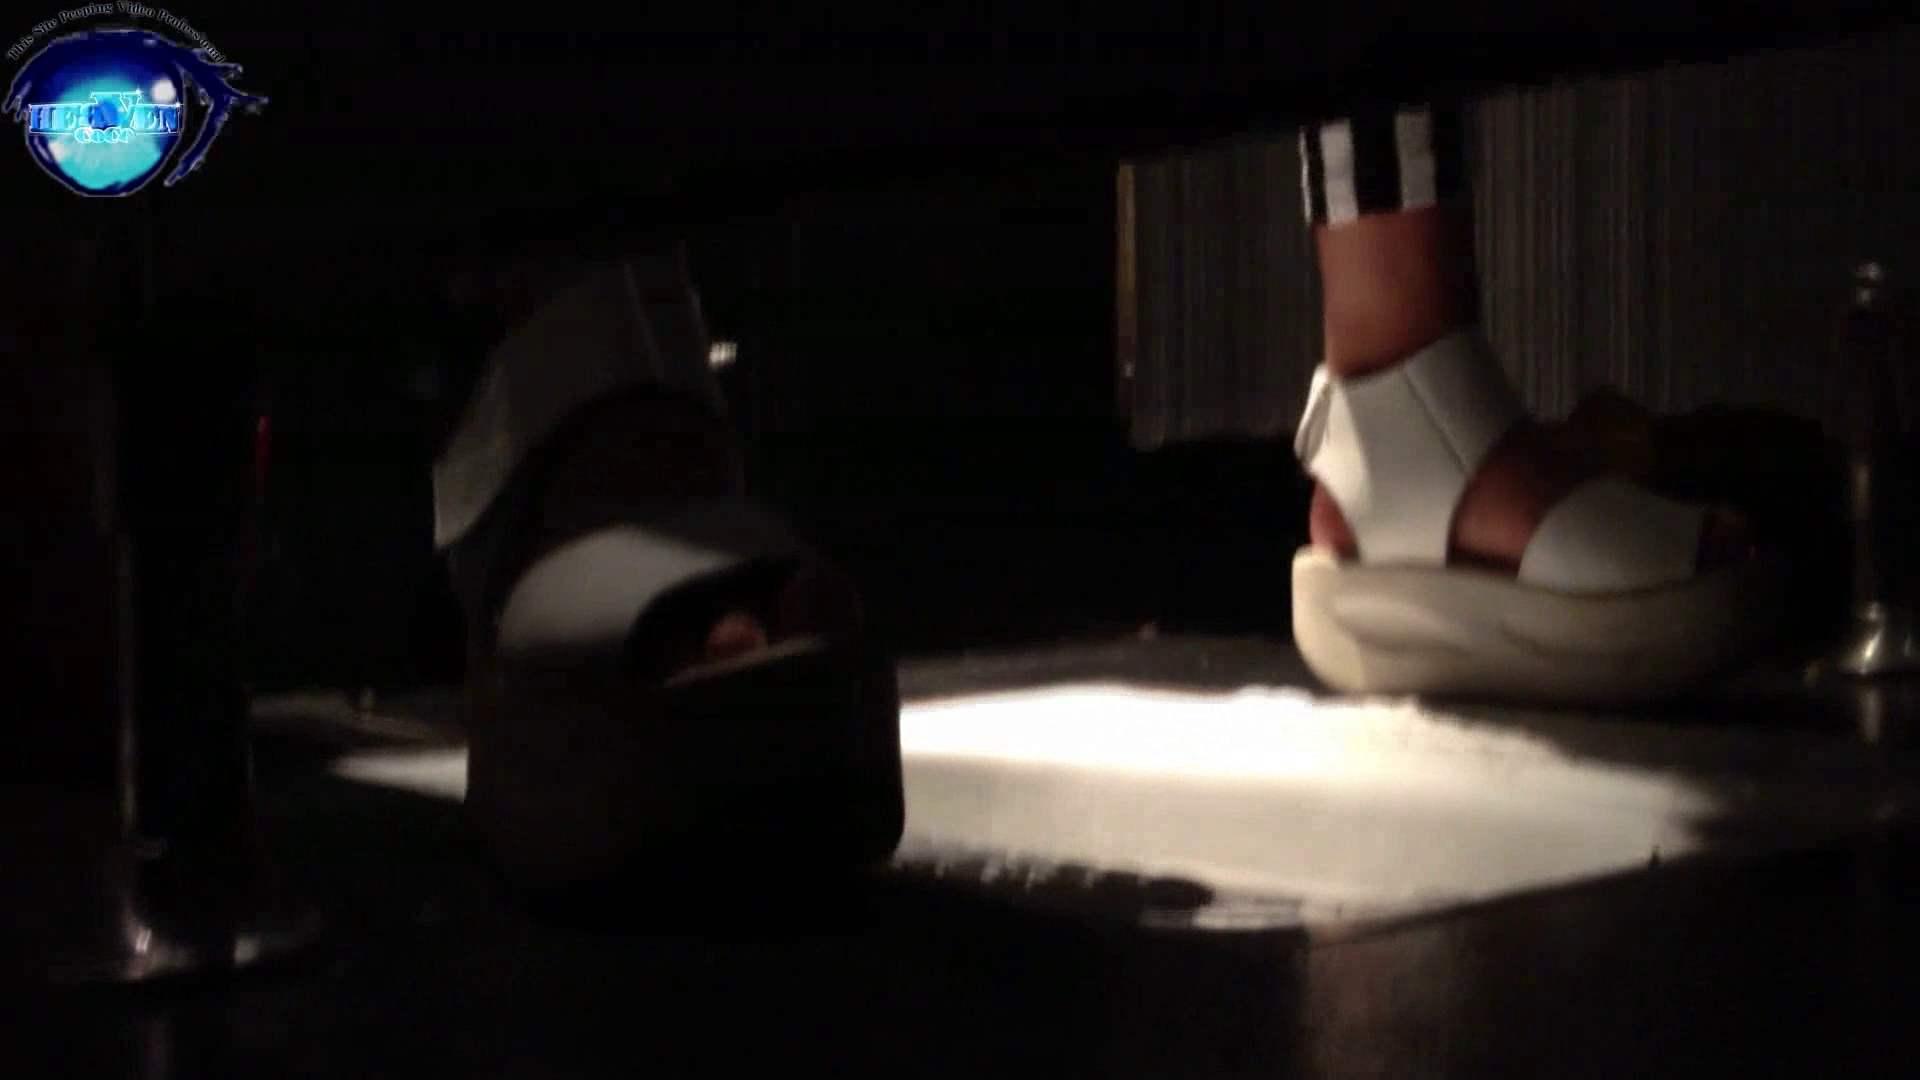 GOD HAND ファッションショッピングセンター盗撮vol.02前編 盗撮 ワレメ無修正動画無料 74連発 8